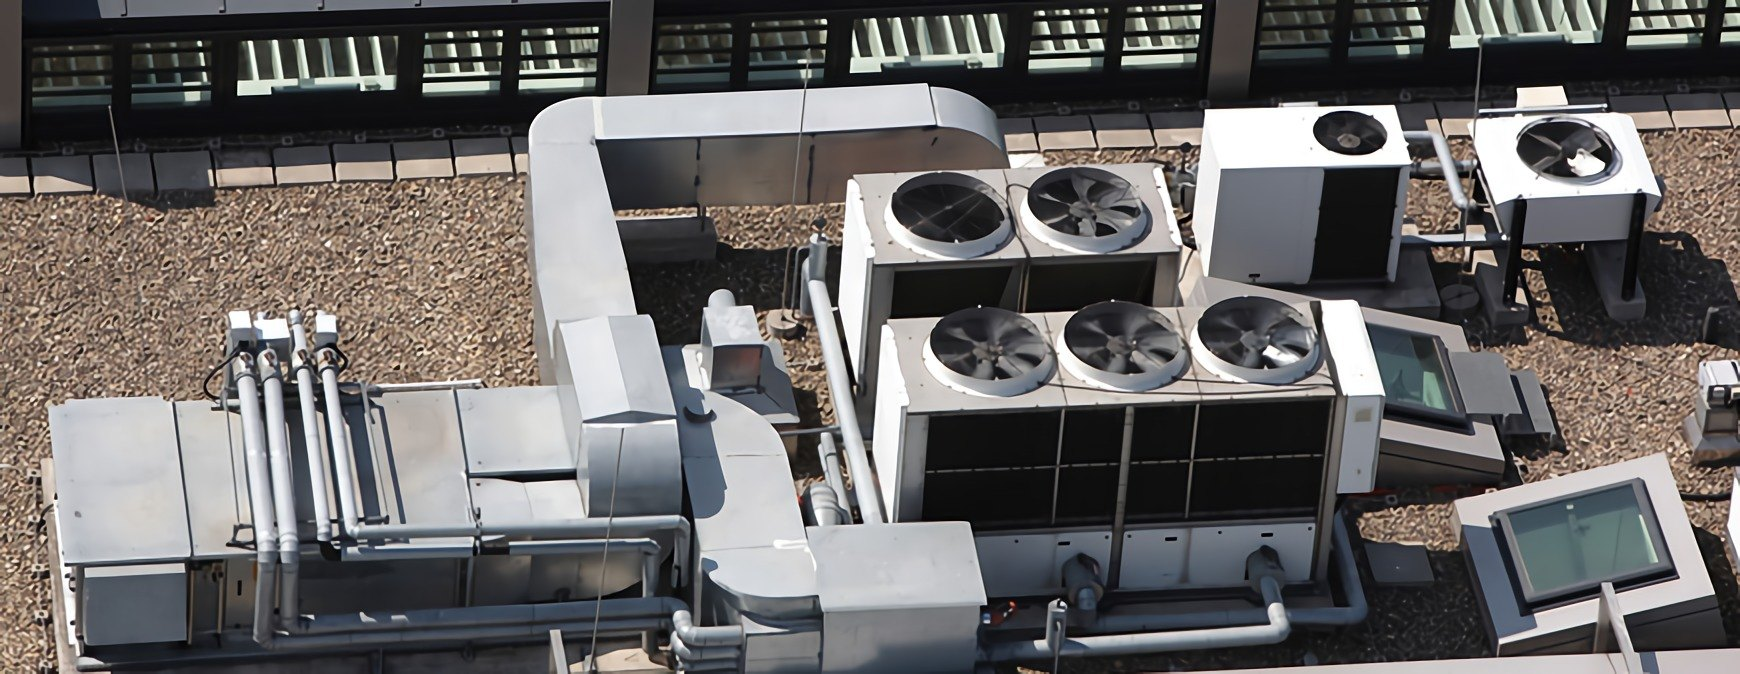 hvac cooling load